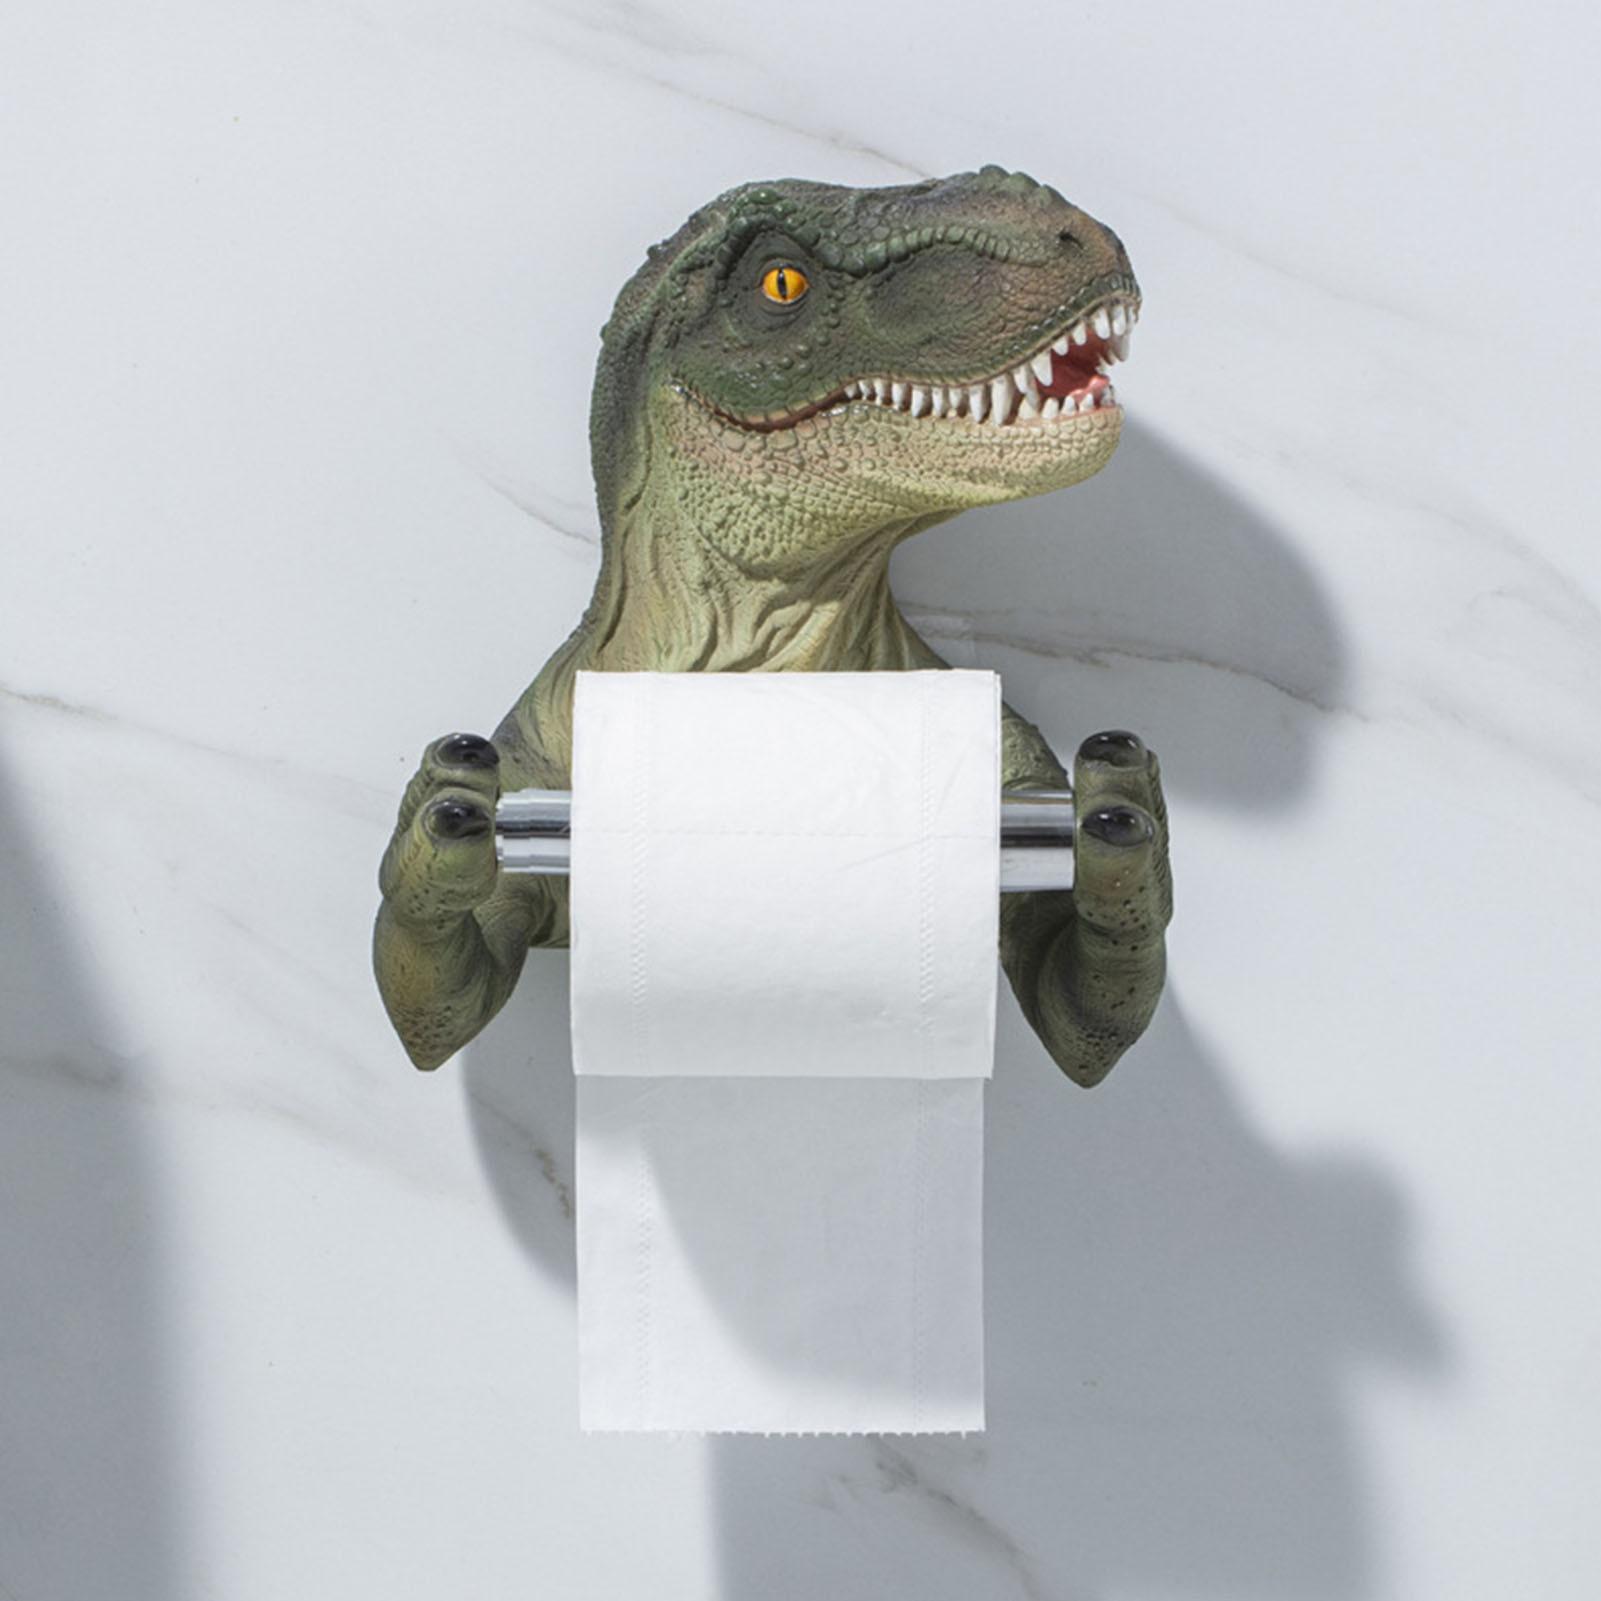 Creative Dinosaur Toilet Paper Paper Rack Bathroom Storage Rack Toilet Paper Towel Holders Rack Roll Barrel Punching Tissue Box